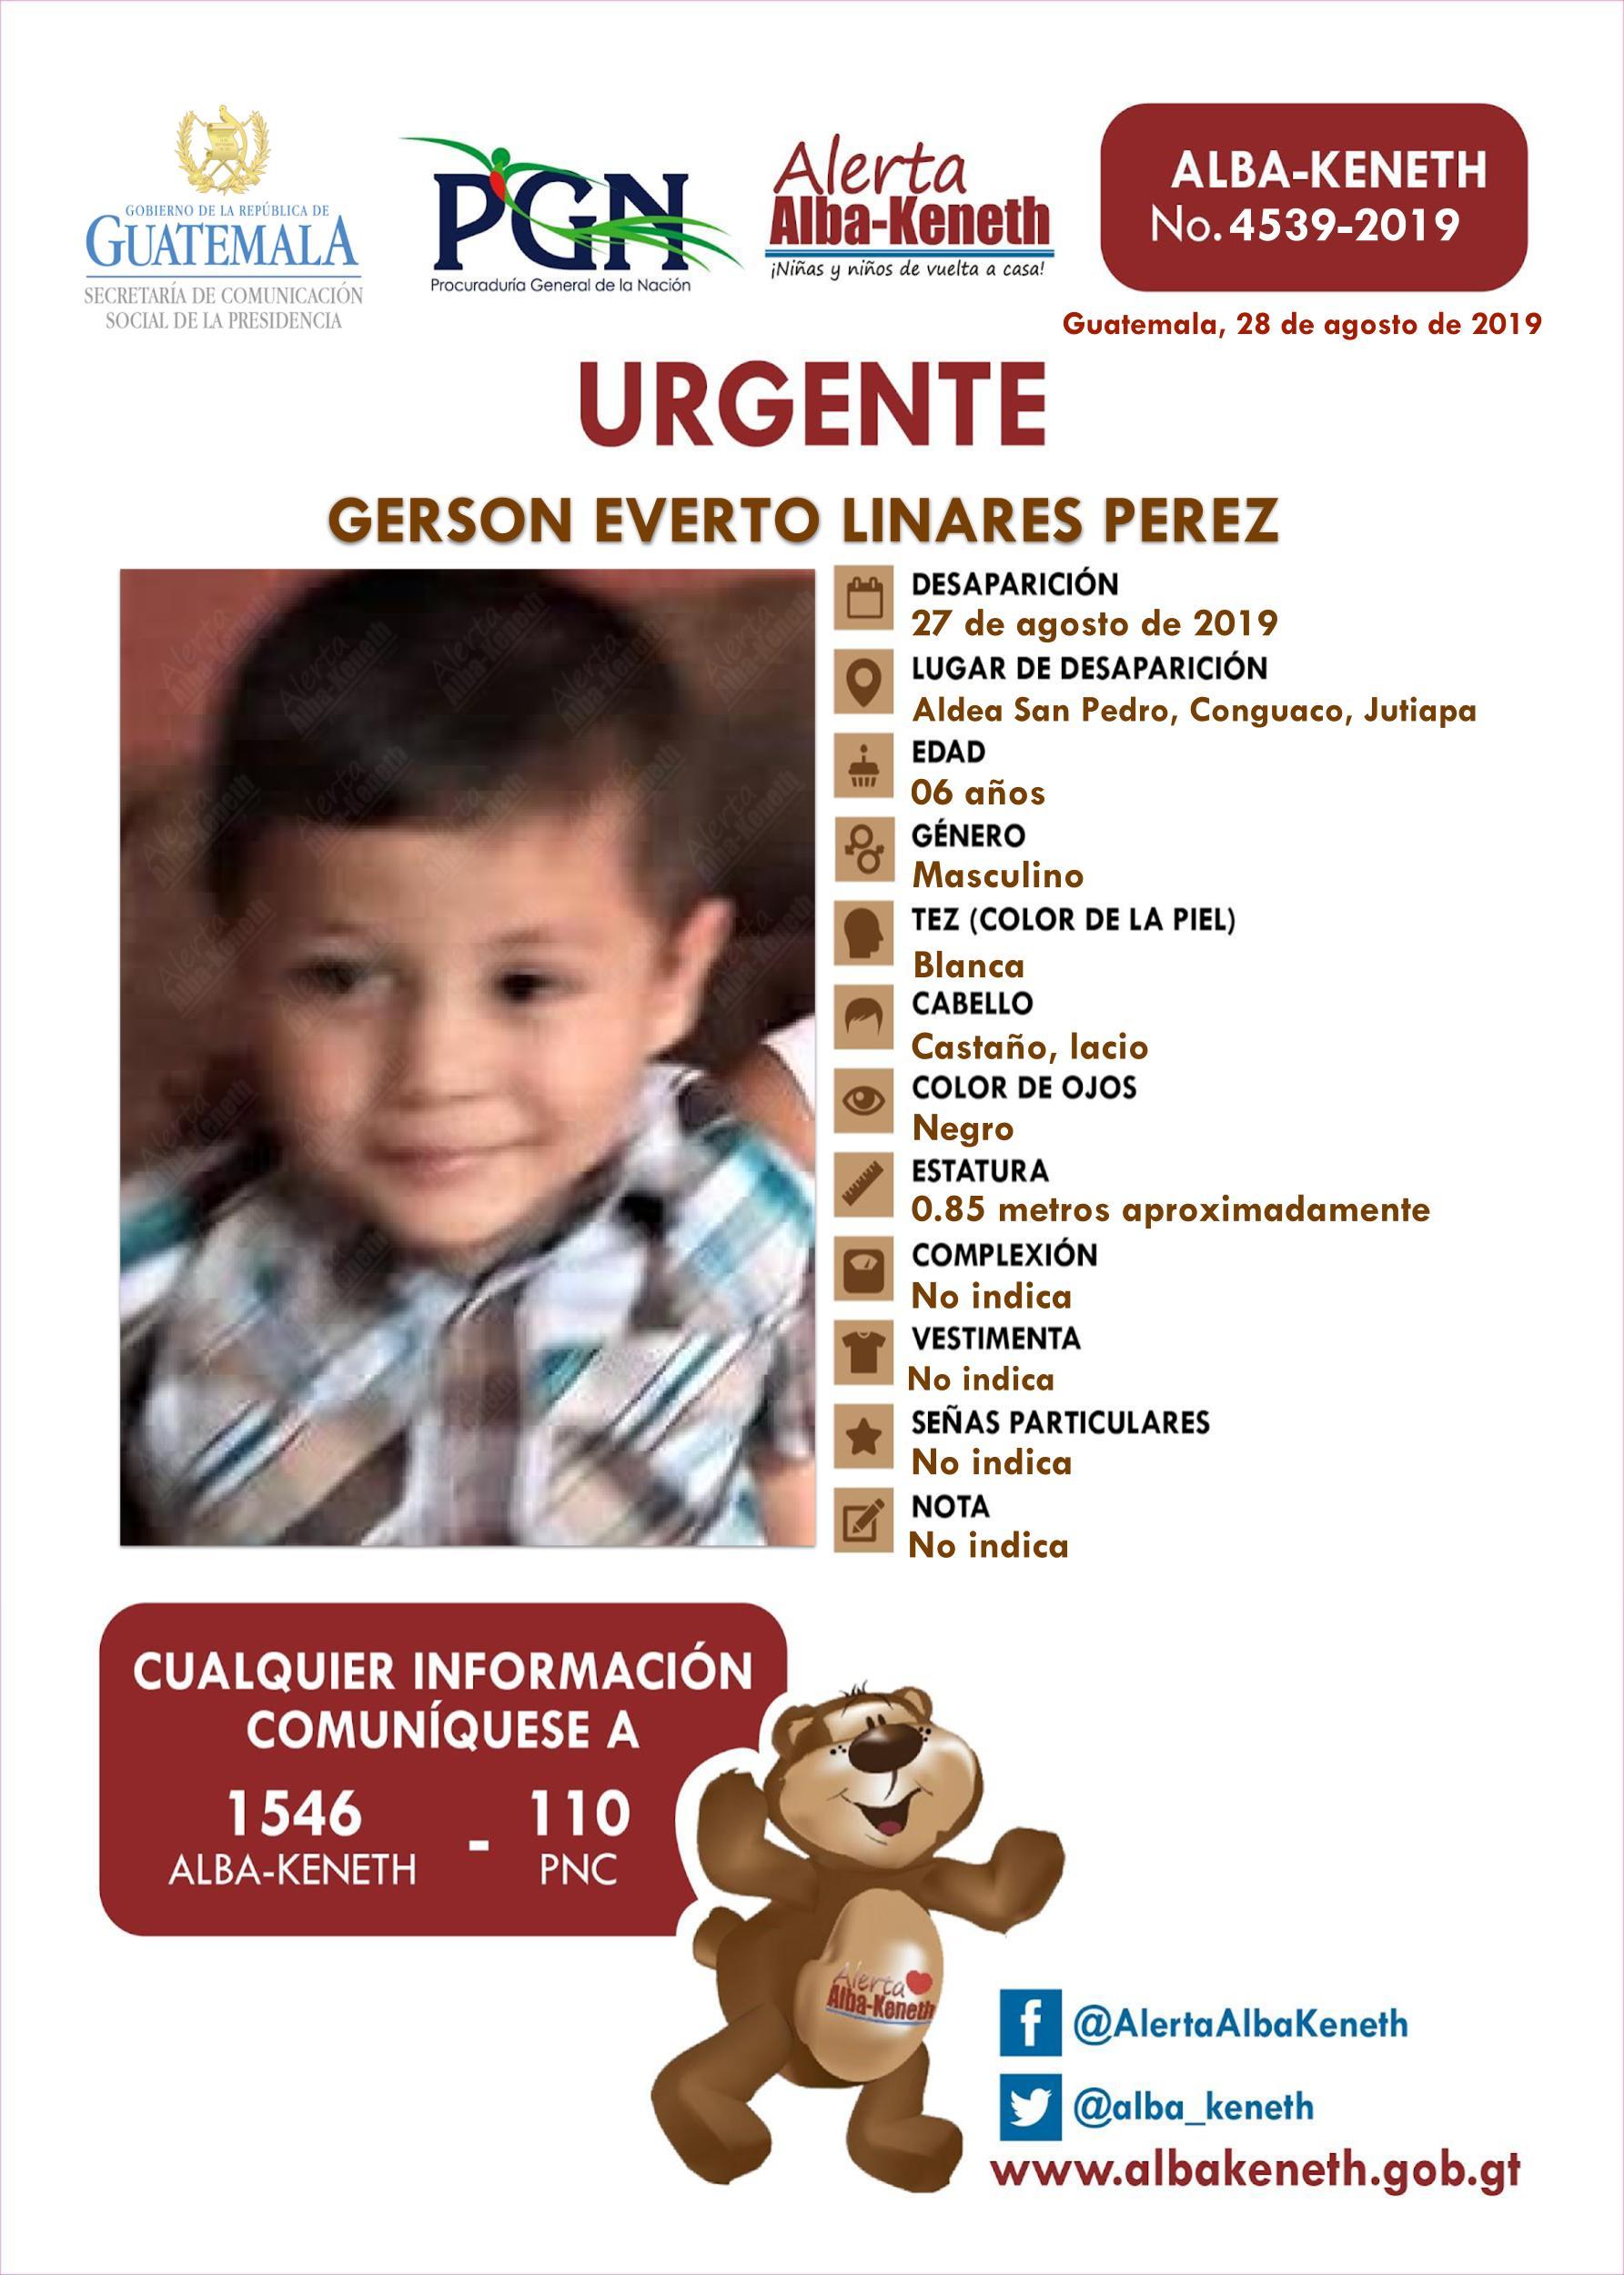 Gerson Everto Linares Perez